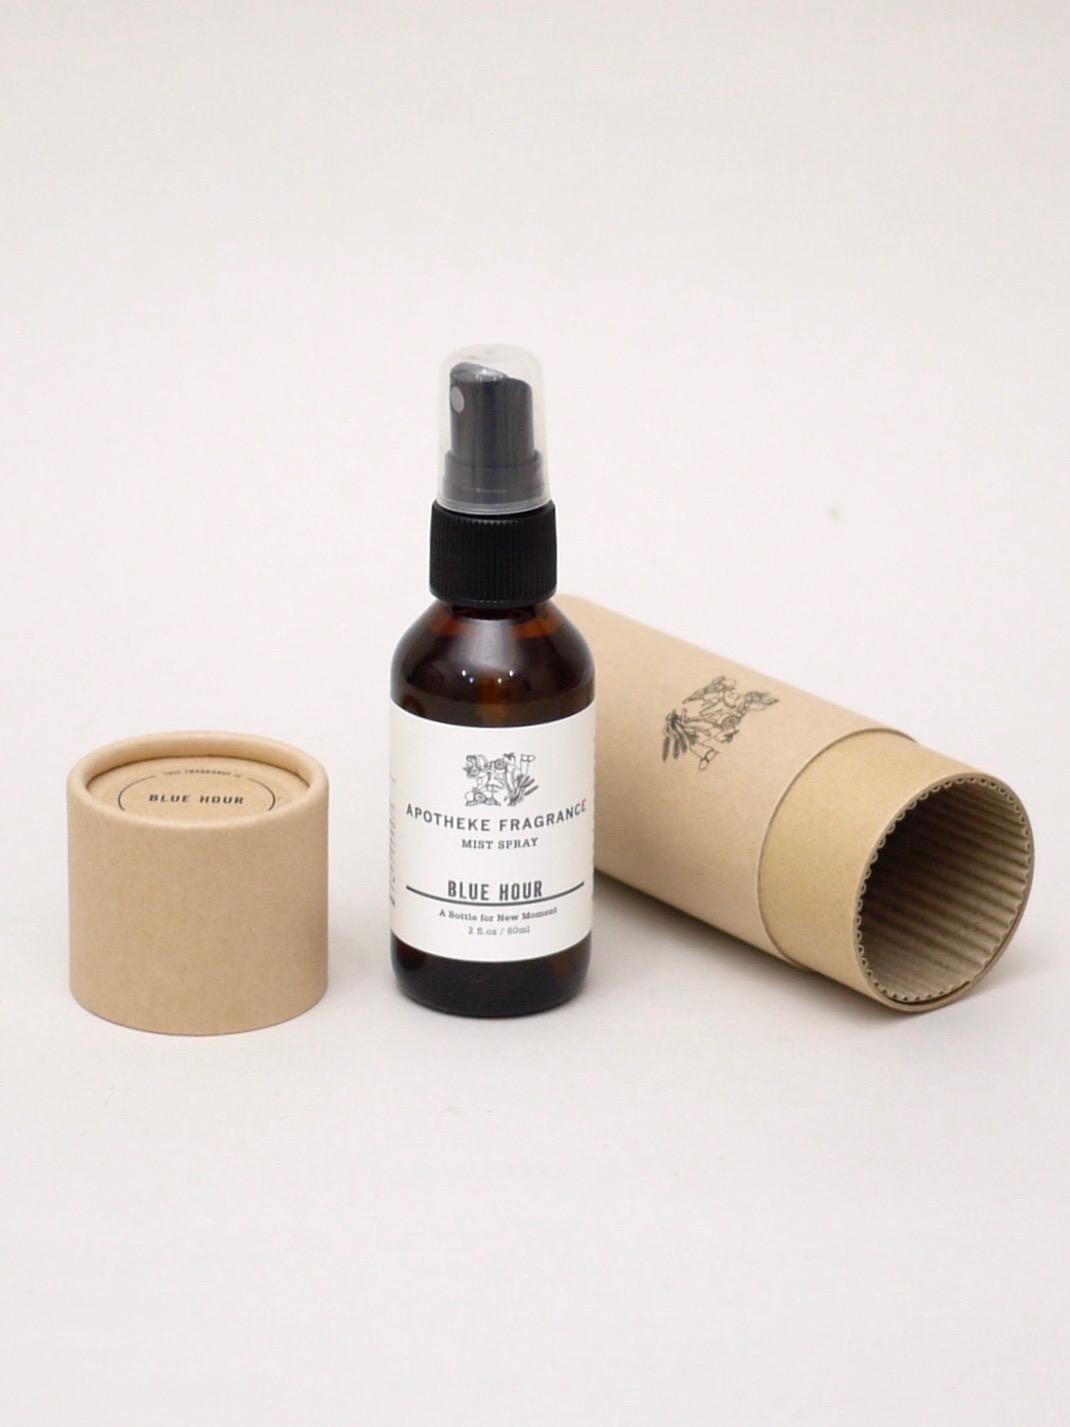 APOTHEKE FRAGRANCE Room Mist Spray